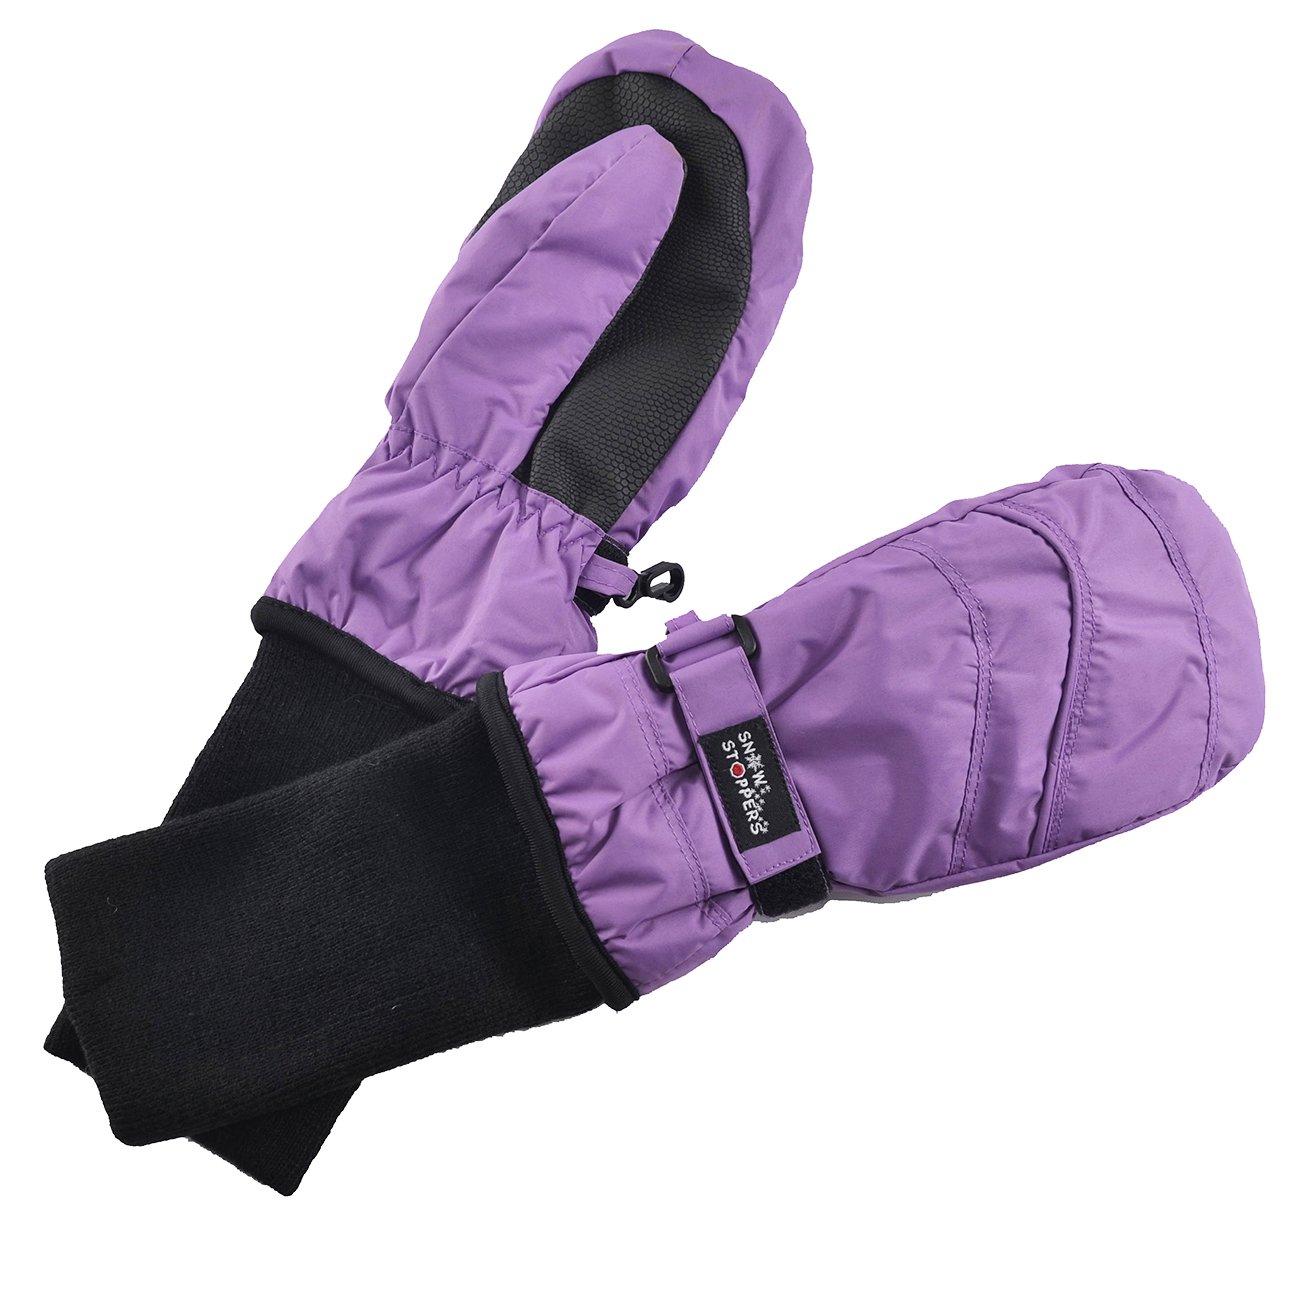 SnowStoppers Kid's Waterproof Stay On Winter Nylon Mittens Medium / 2-5 Years Deep Lilac